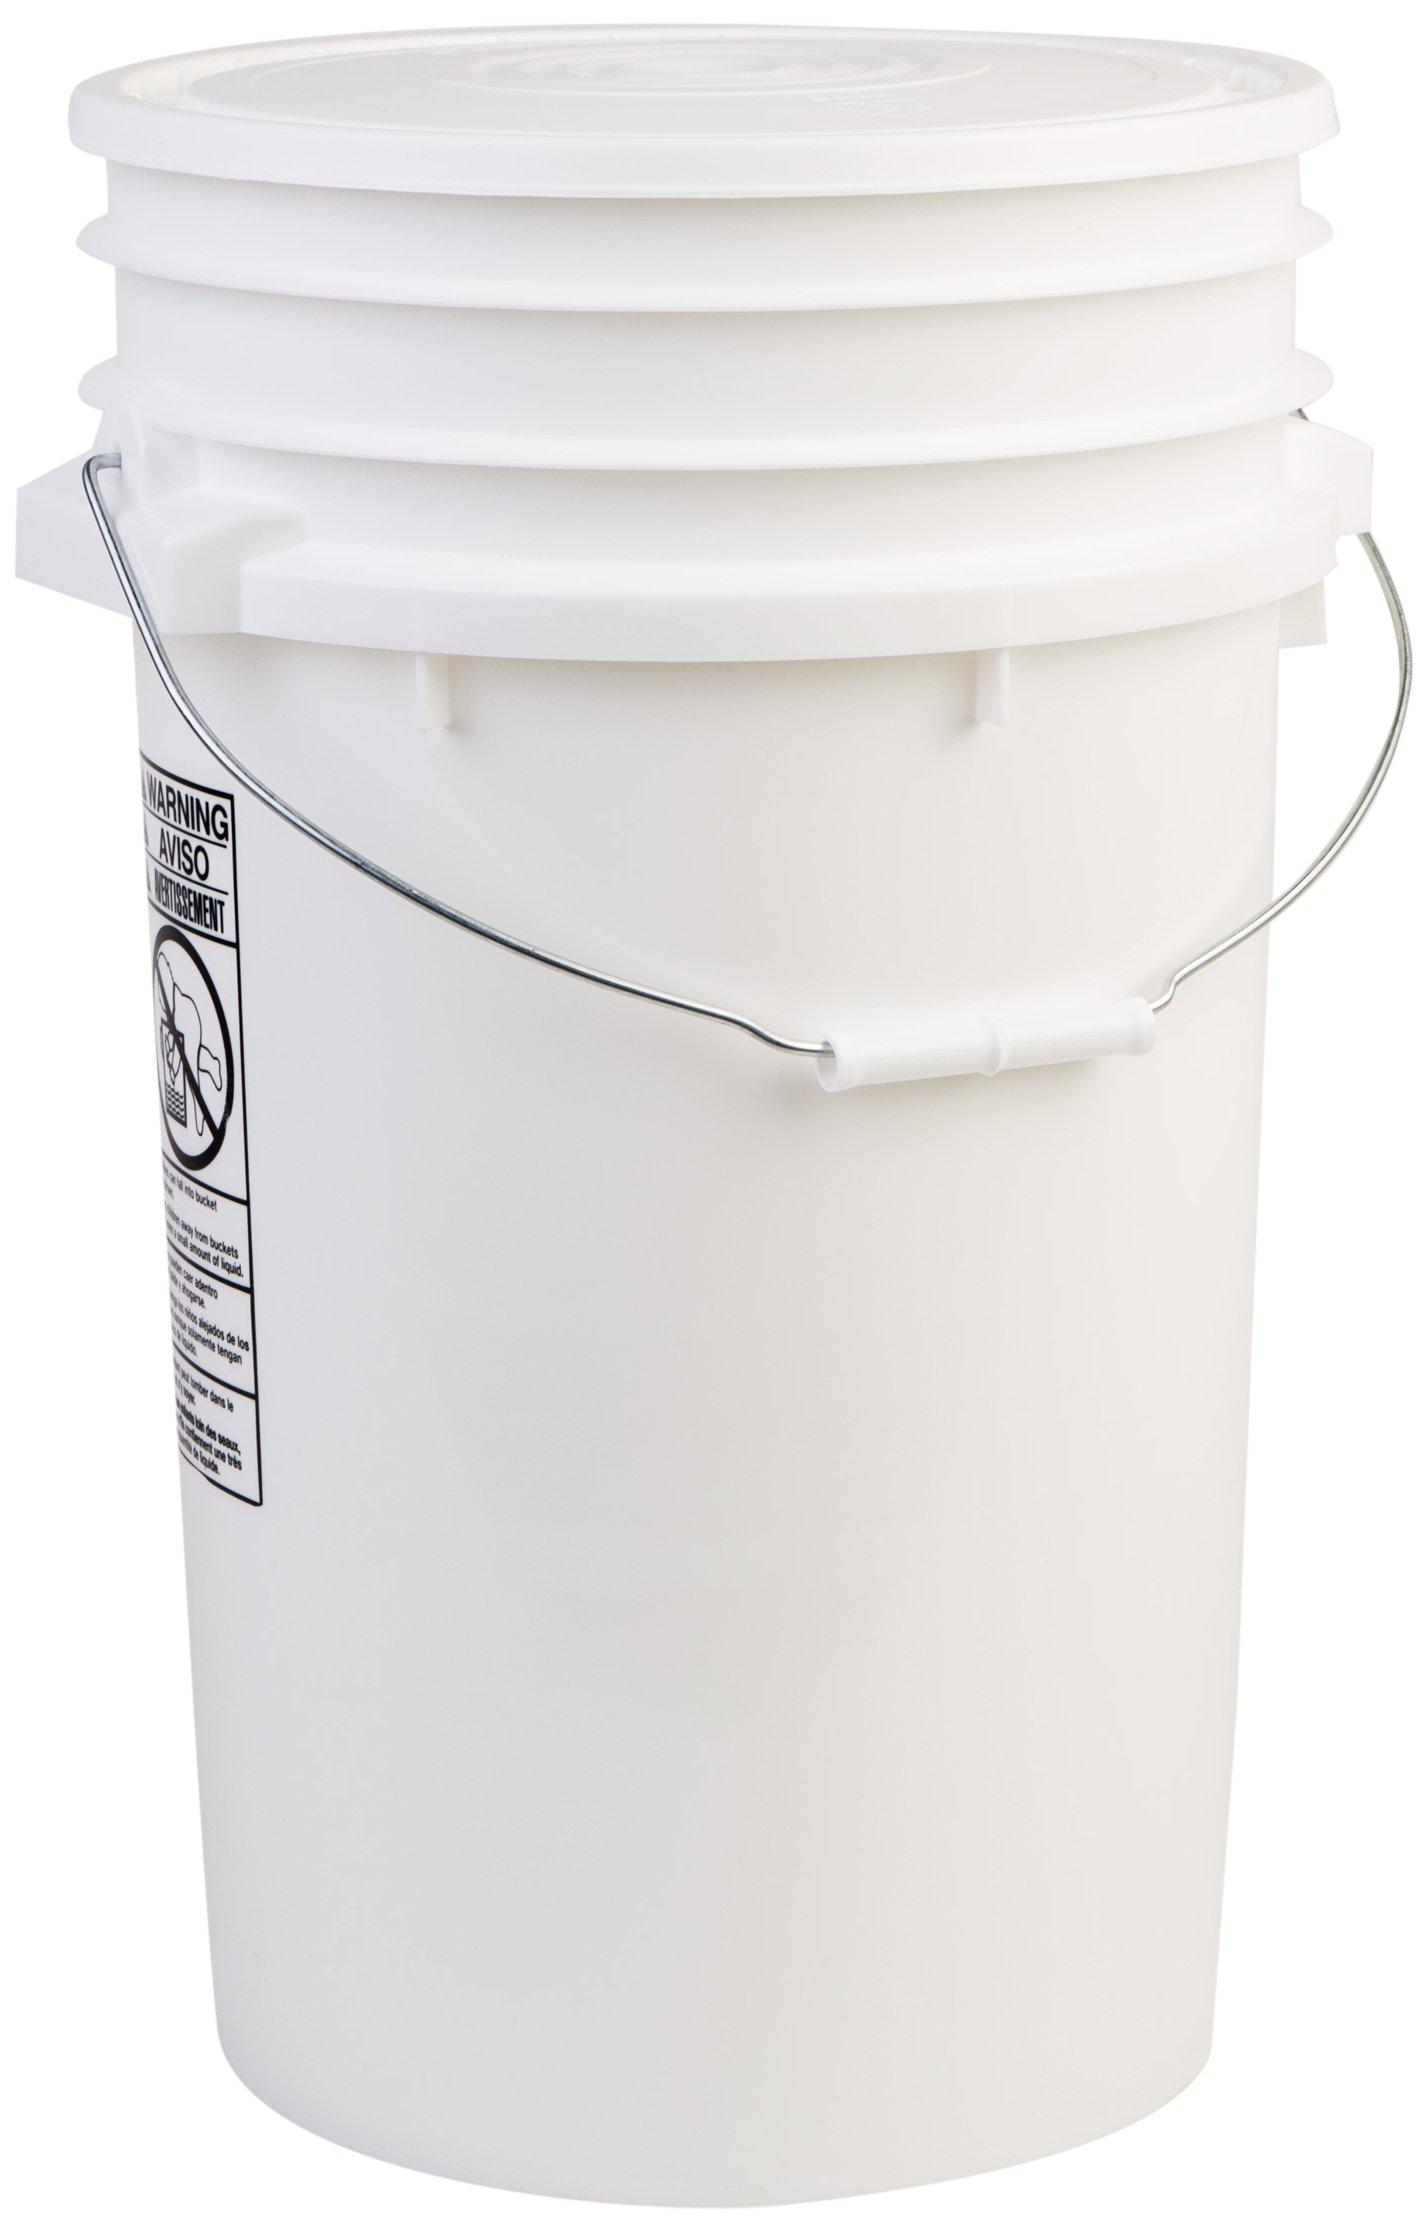 Hudson Exchange Premium 7 Gallon Bucket with Lid, HDPE, White